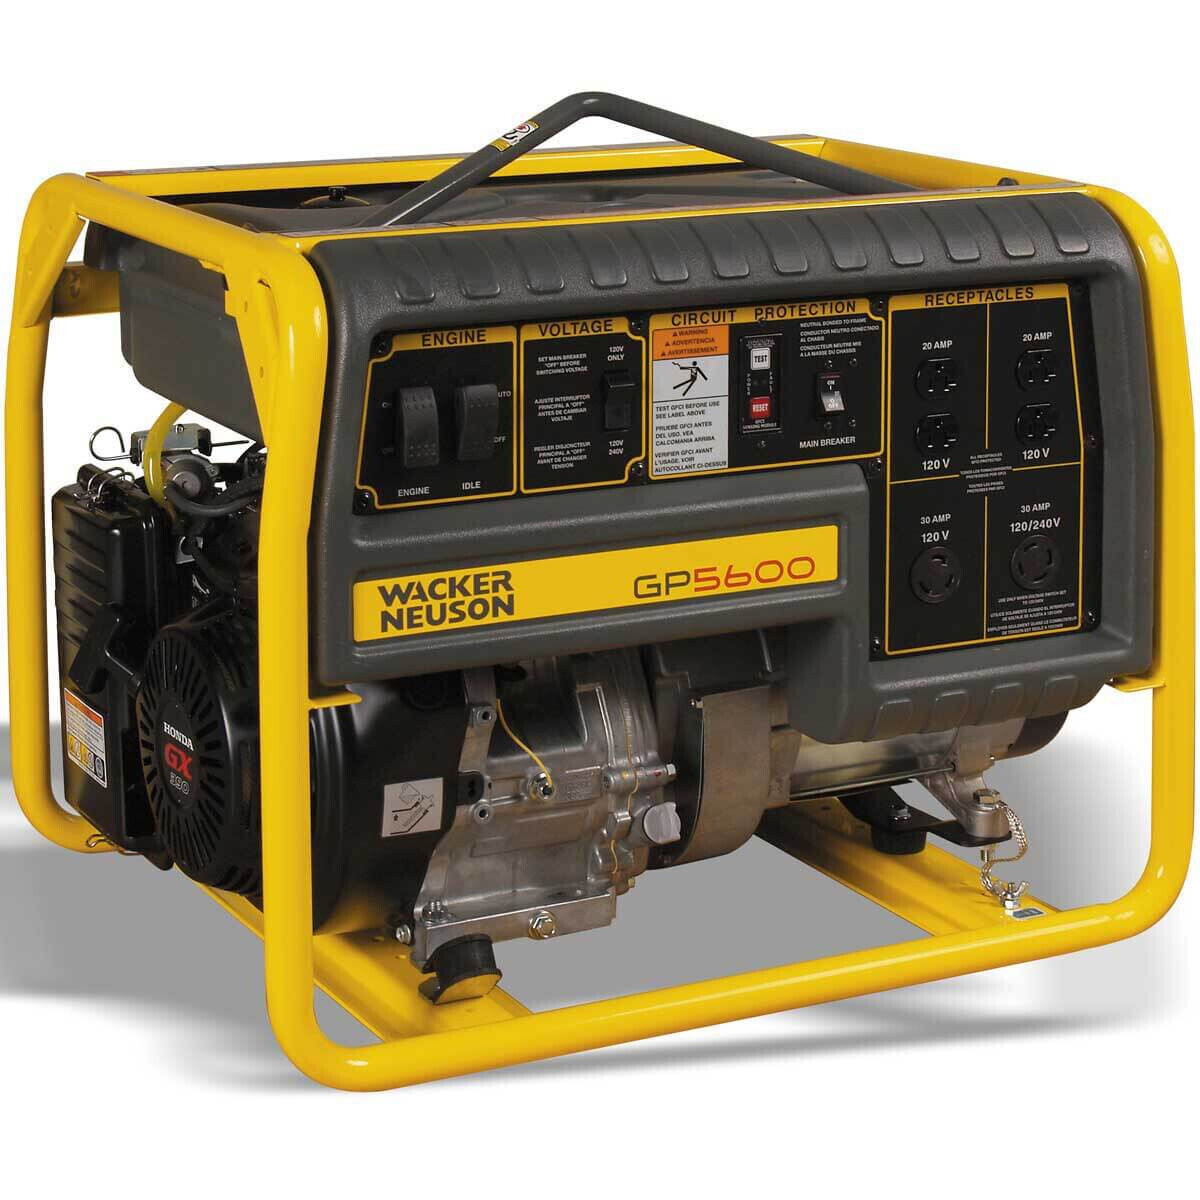 Wacker GP 5600A Portable Generator